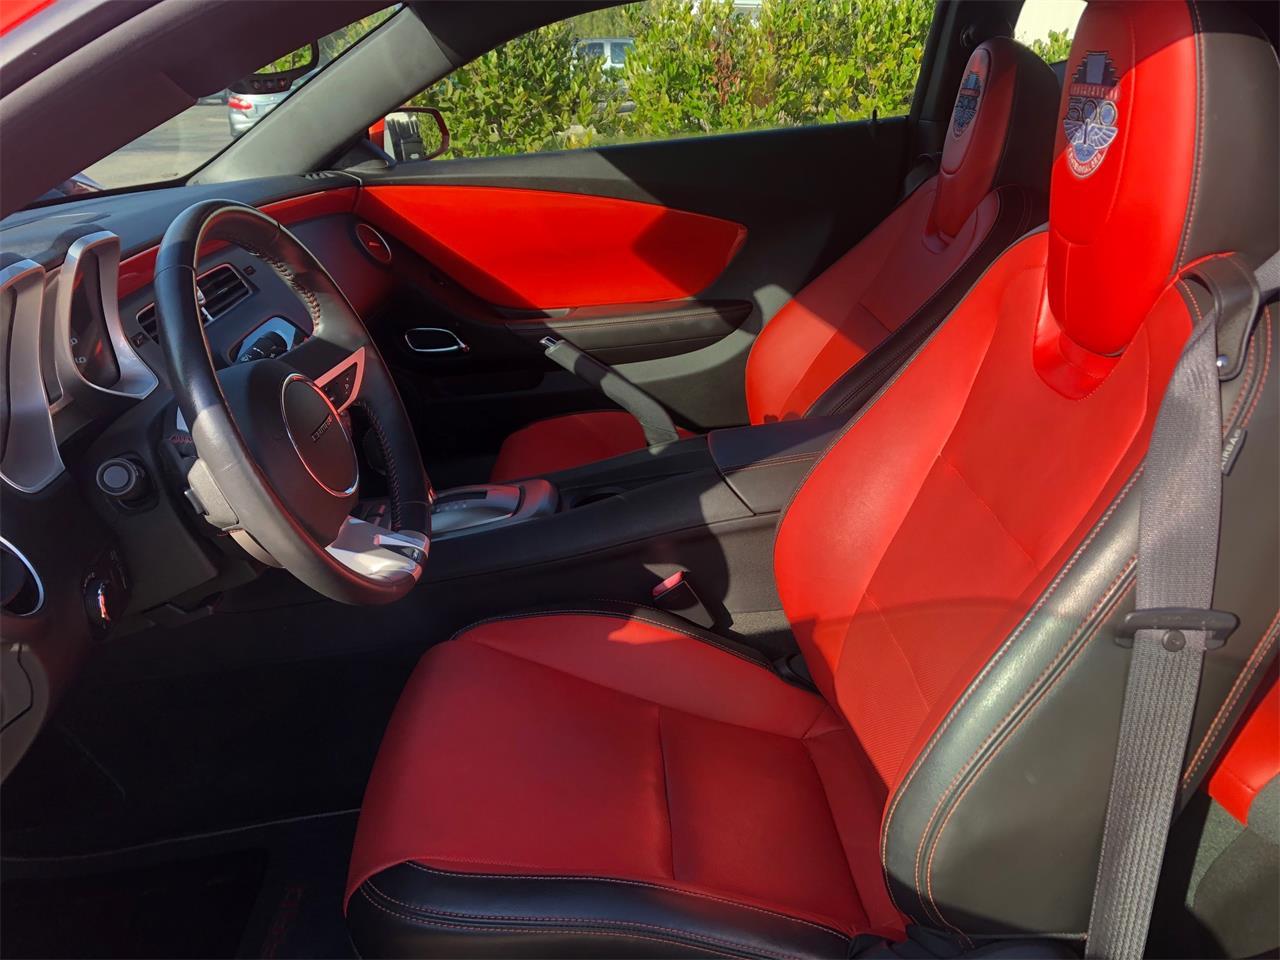 2010 Chevrolet Camaro (CC-1317973) for sale in Orange, California